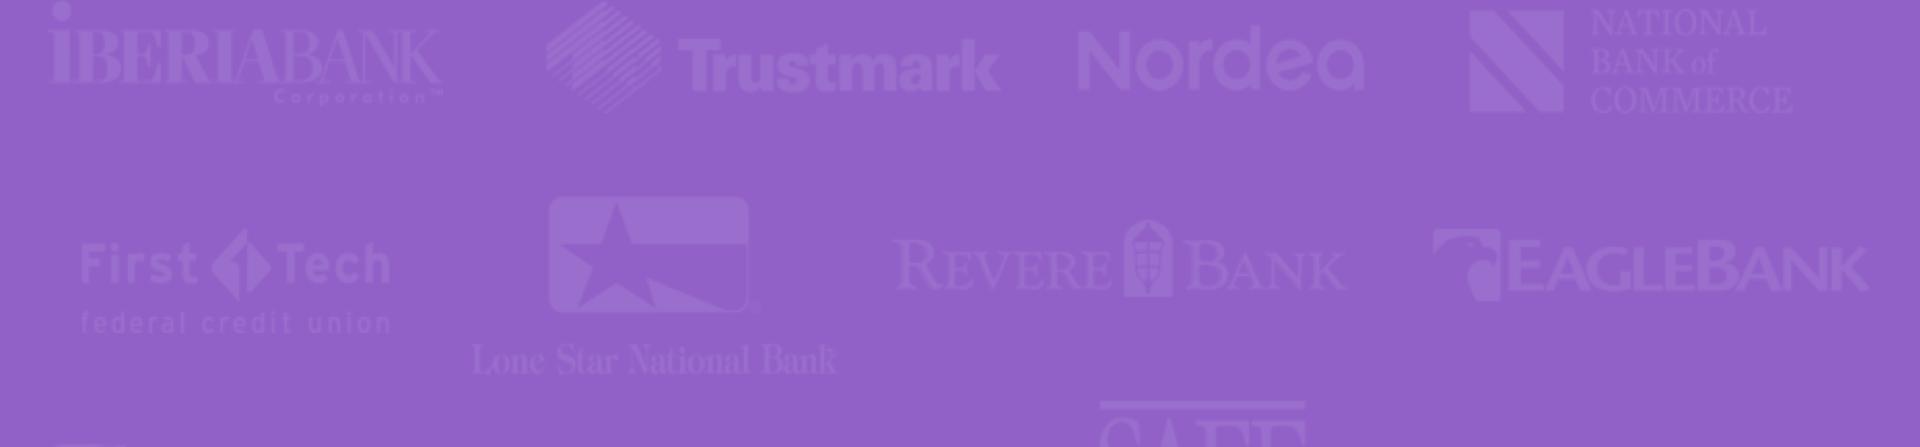 logo-bng-purple